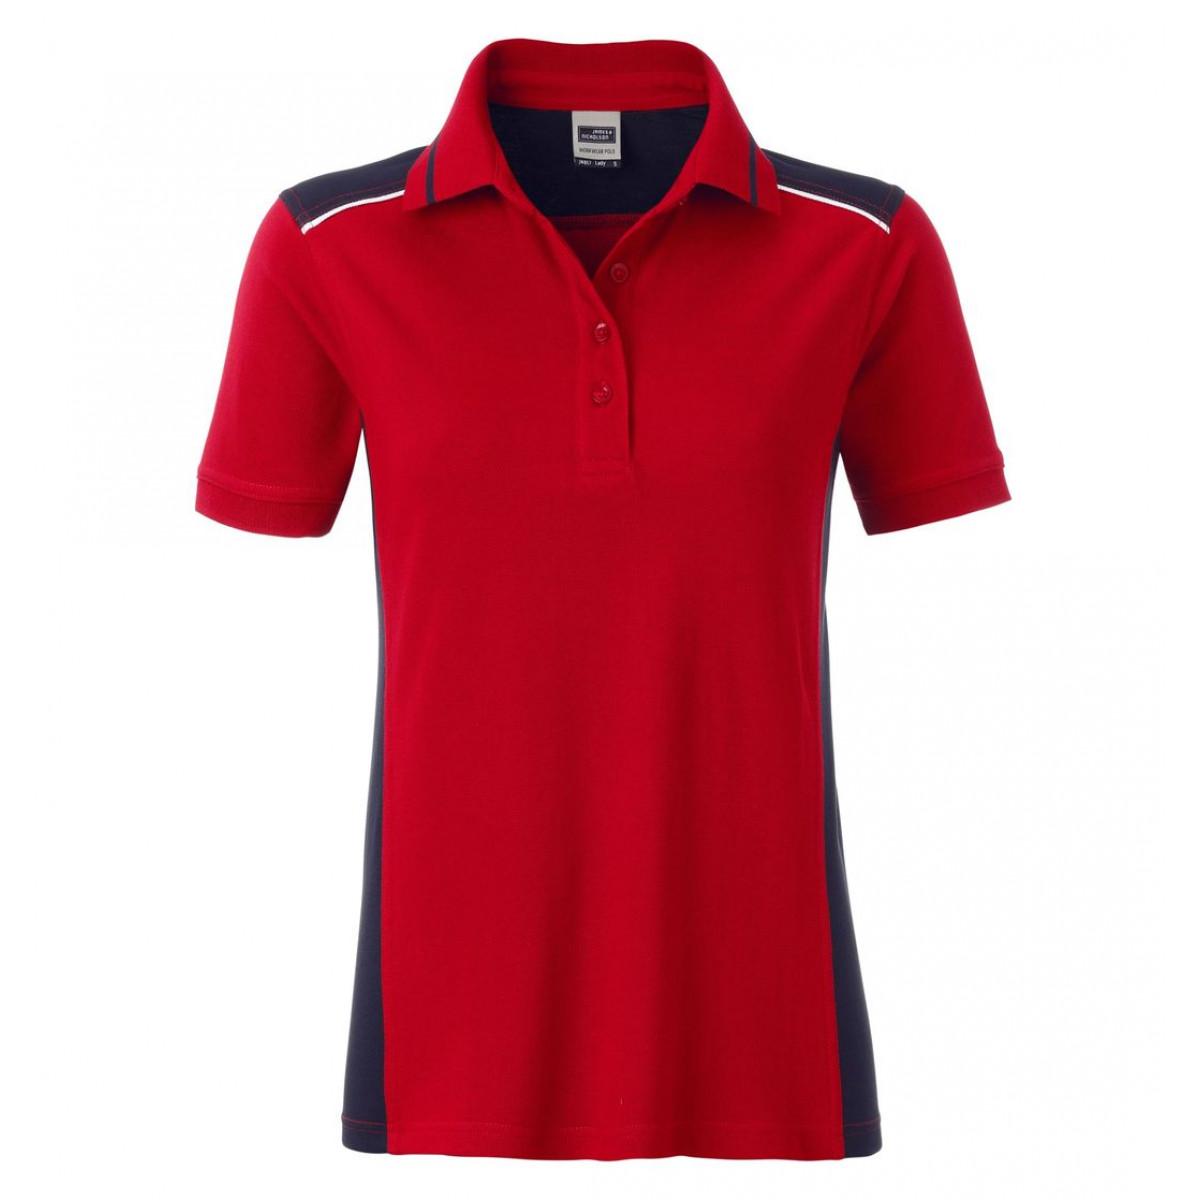 Рубашка поло женская JN857 Ladies Workwear Polo-Level 2 - Красный/Темно-синий